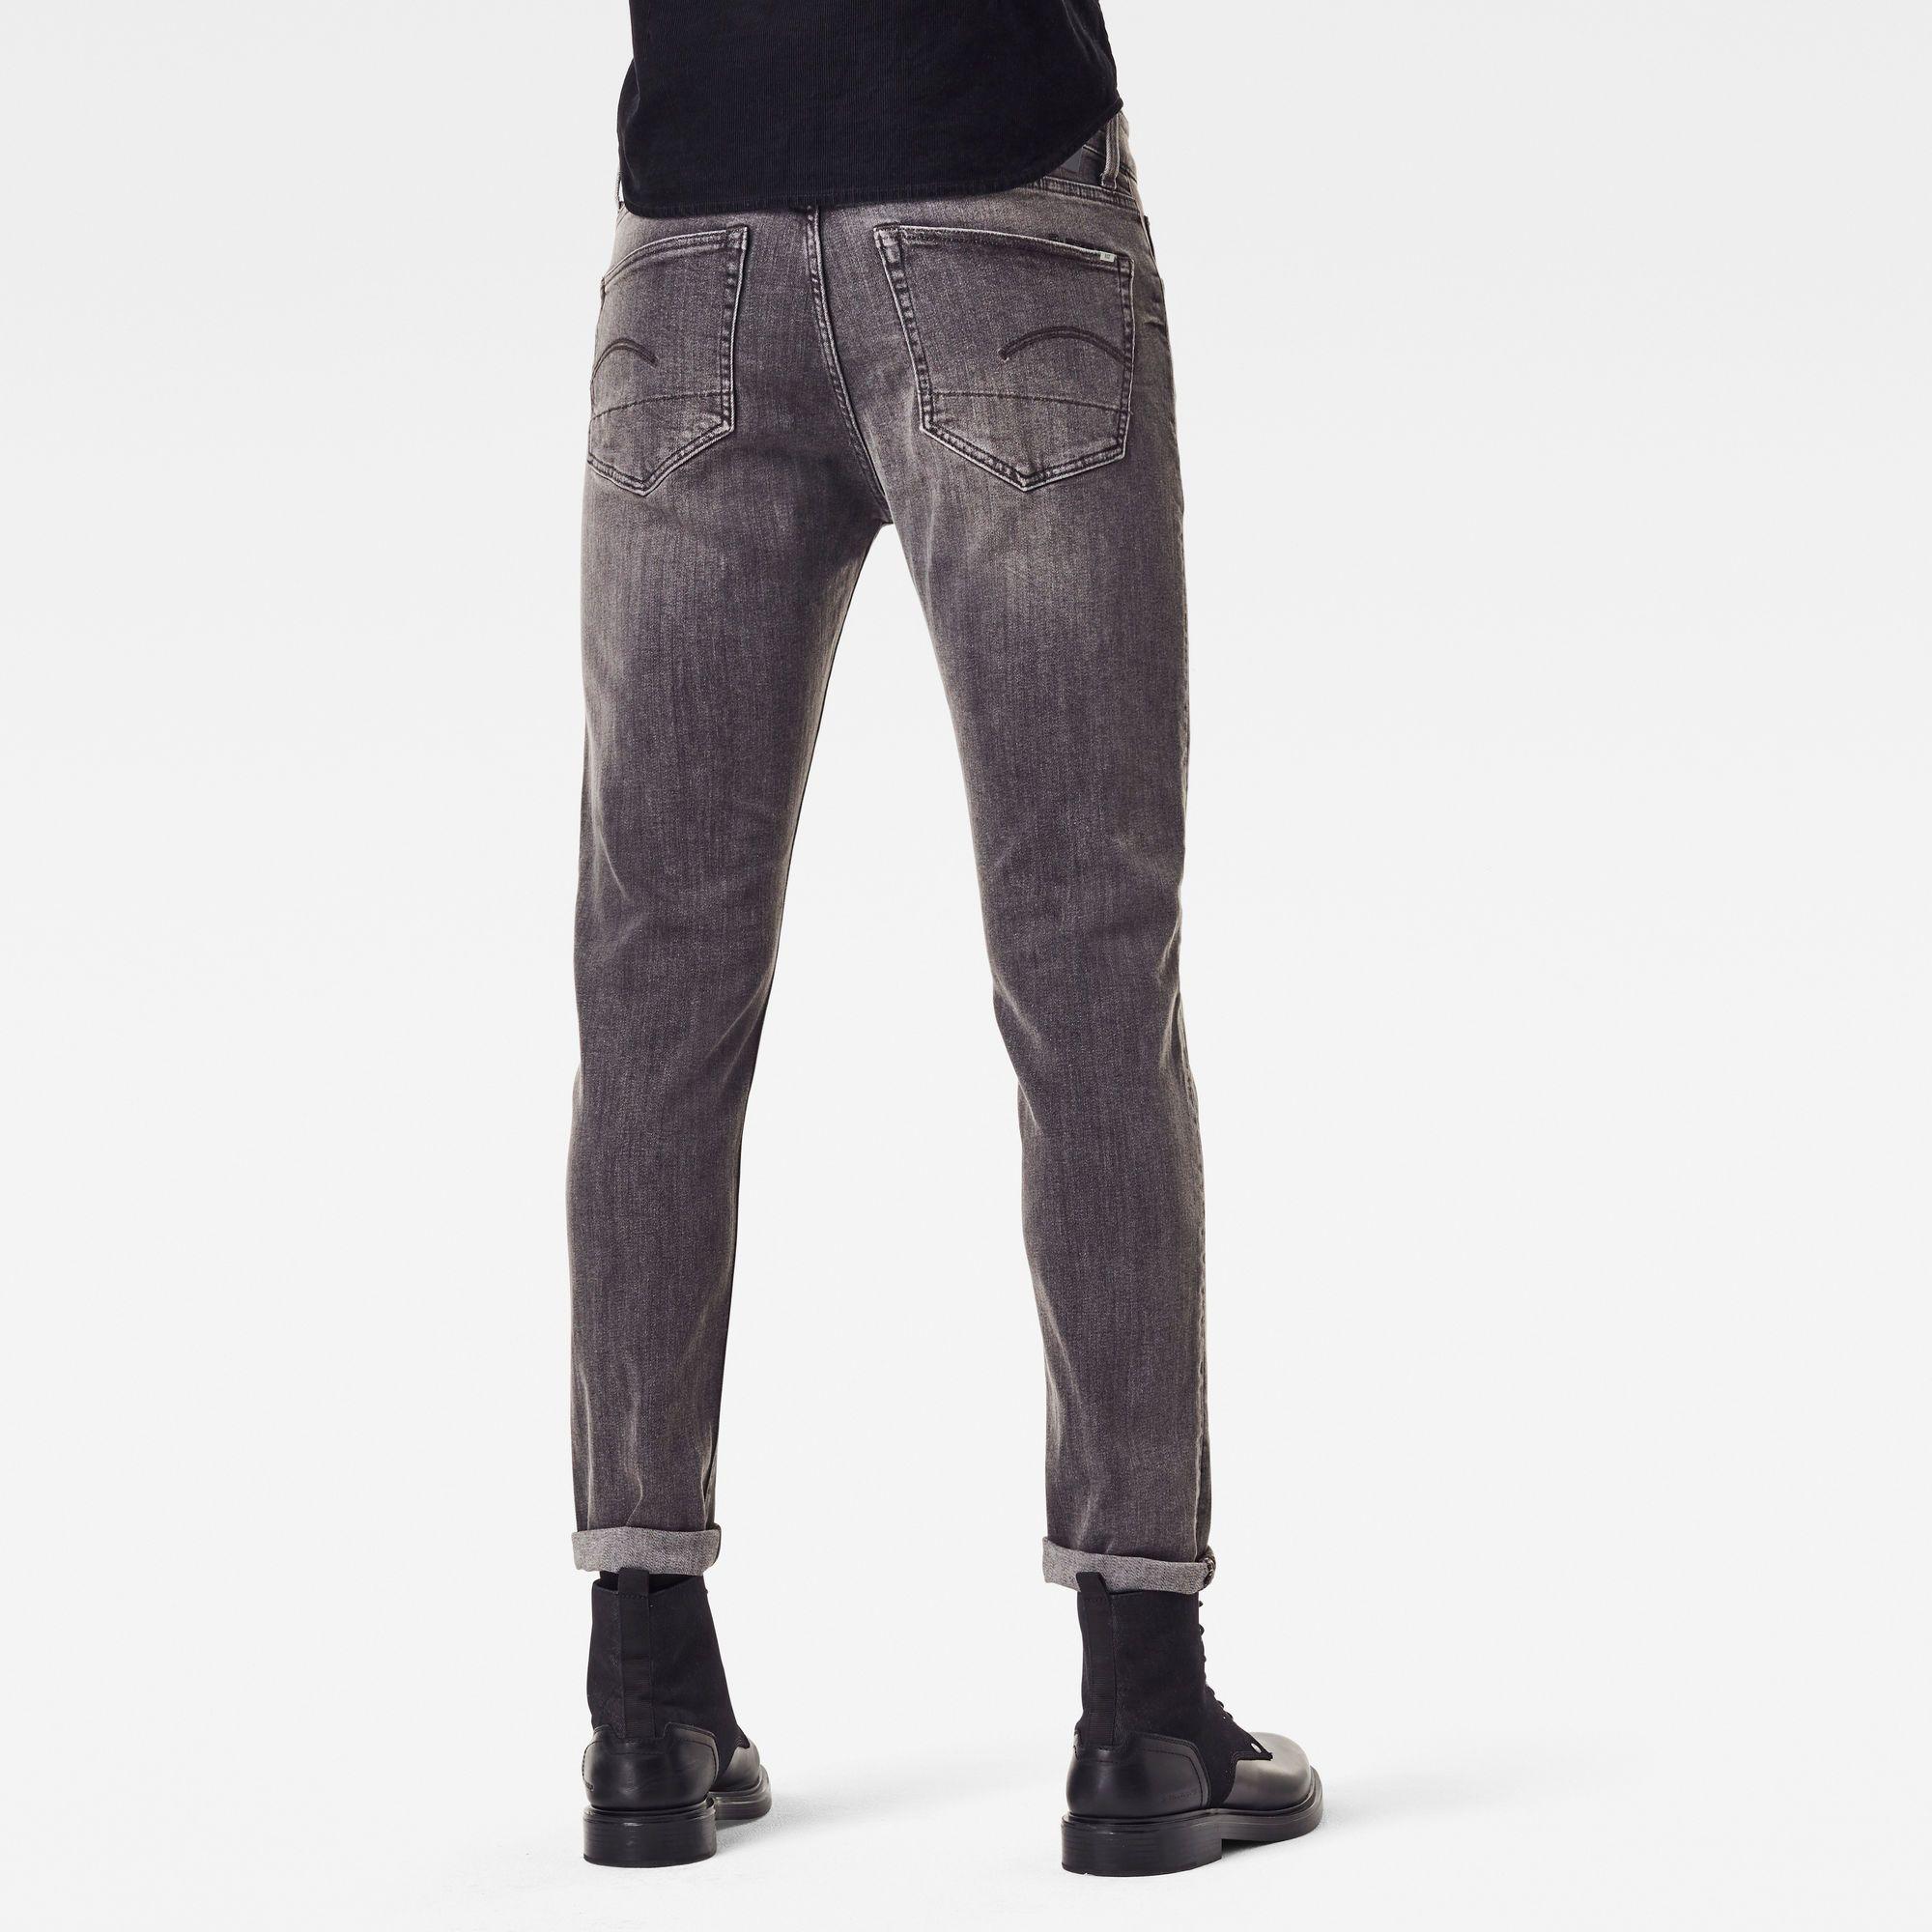 G-Star RAW 3301 Slim Jeans